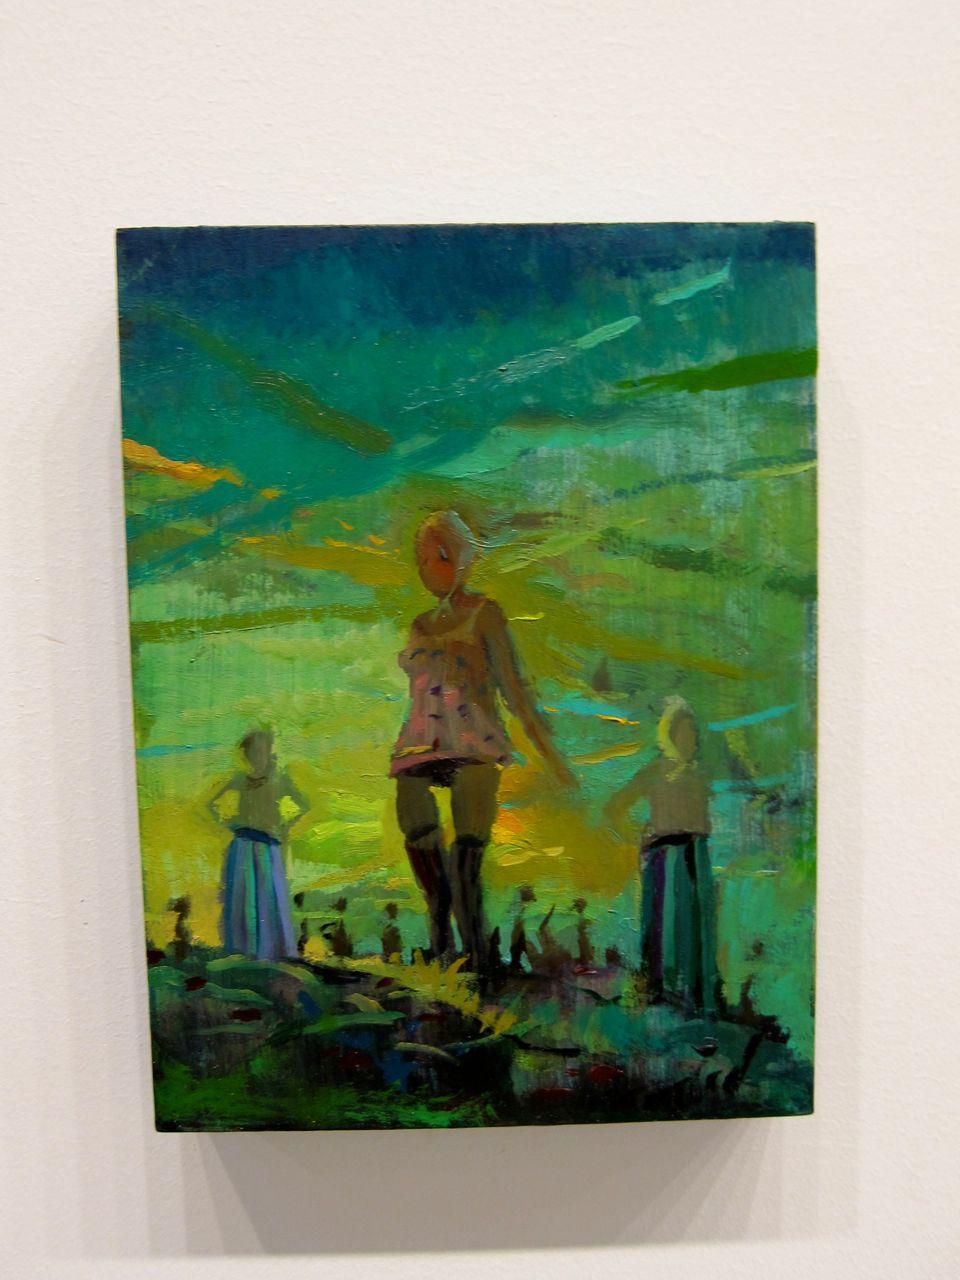 Lisa Yuskavage David Zwirner AM 05